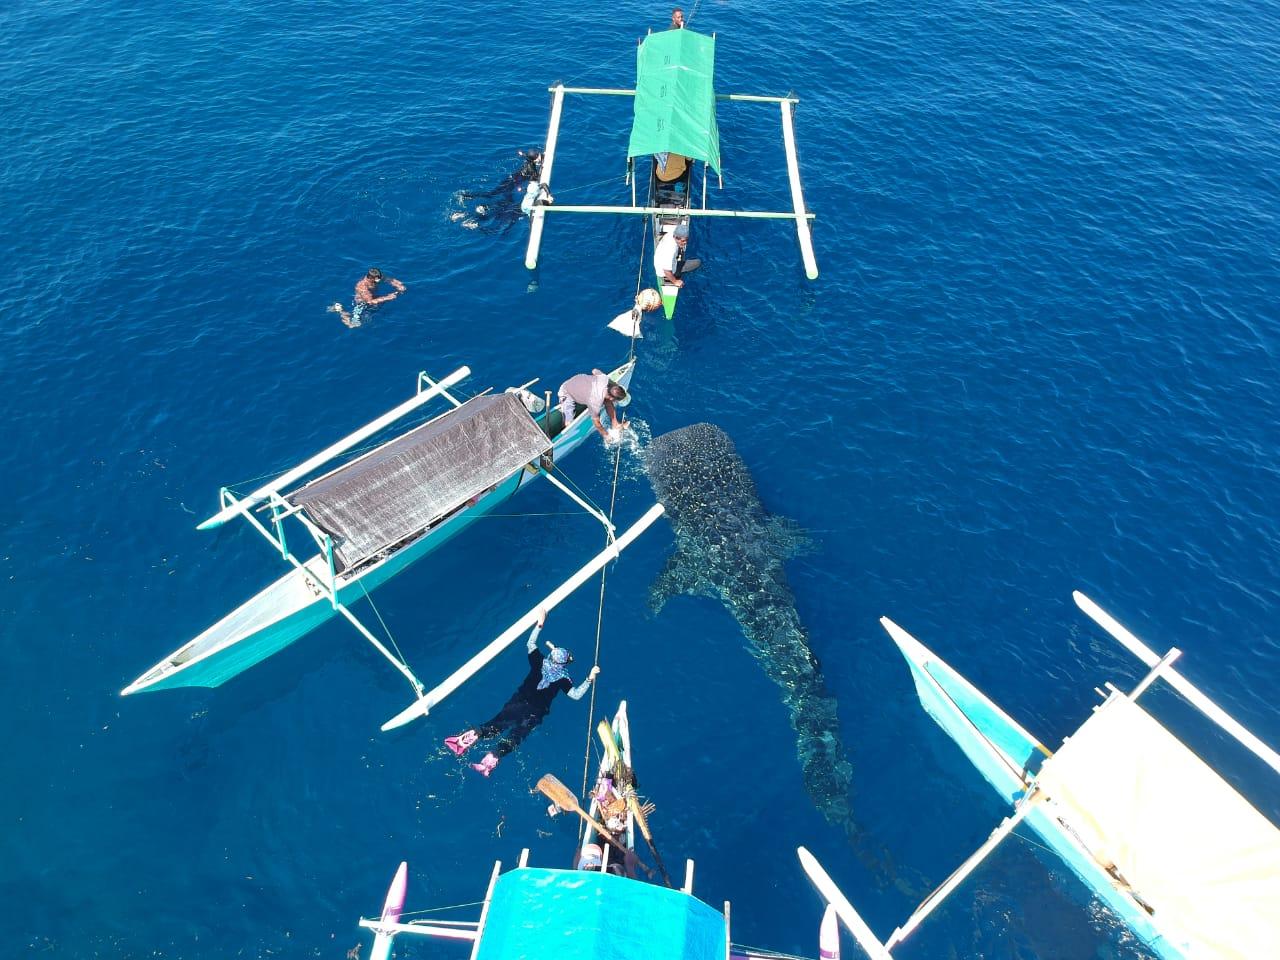 Kehadiran hiu paus di pantai Botubarani, Gorontalo beberapa waktu lalu yang menjadi daya tarik wisatawan lokal maupun mancanegara